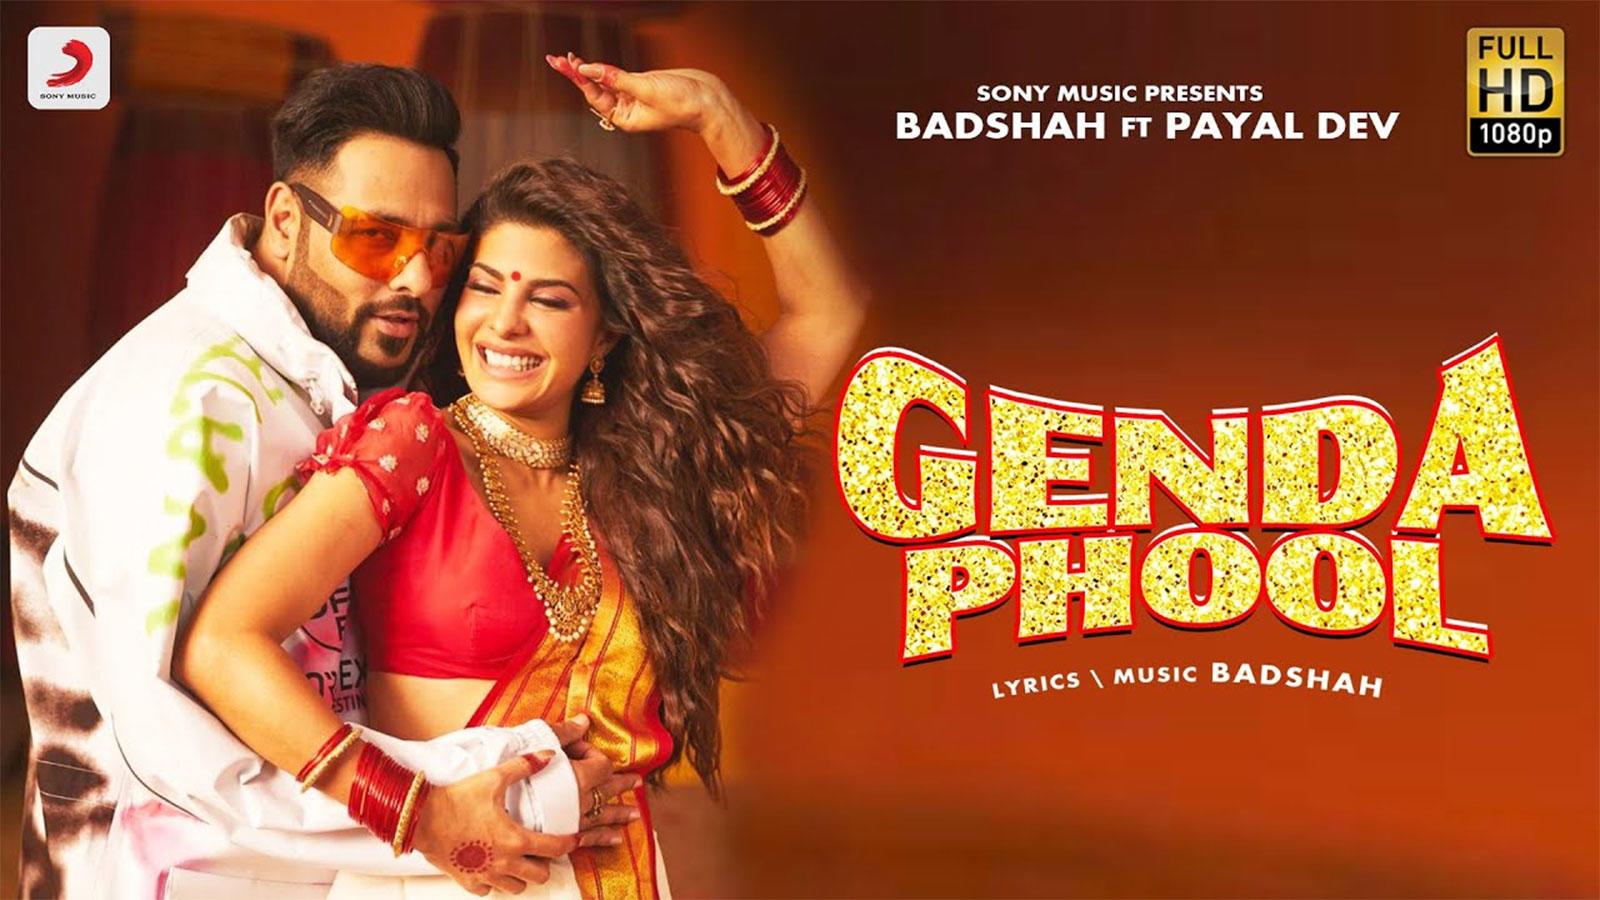 baadshah movie video songs hd 1080p free download